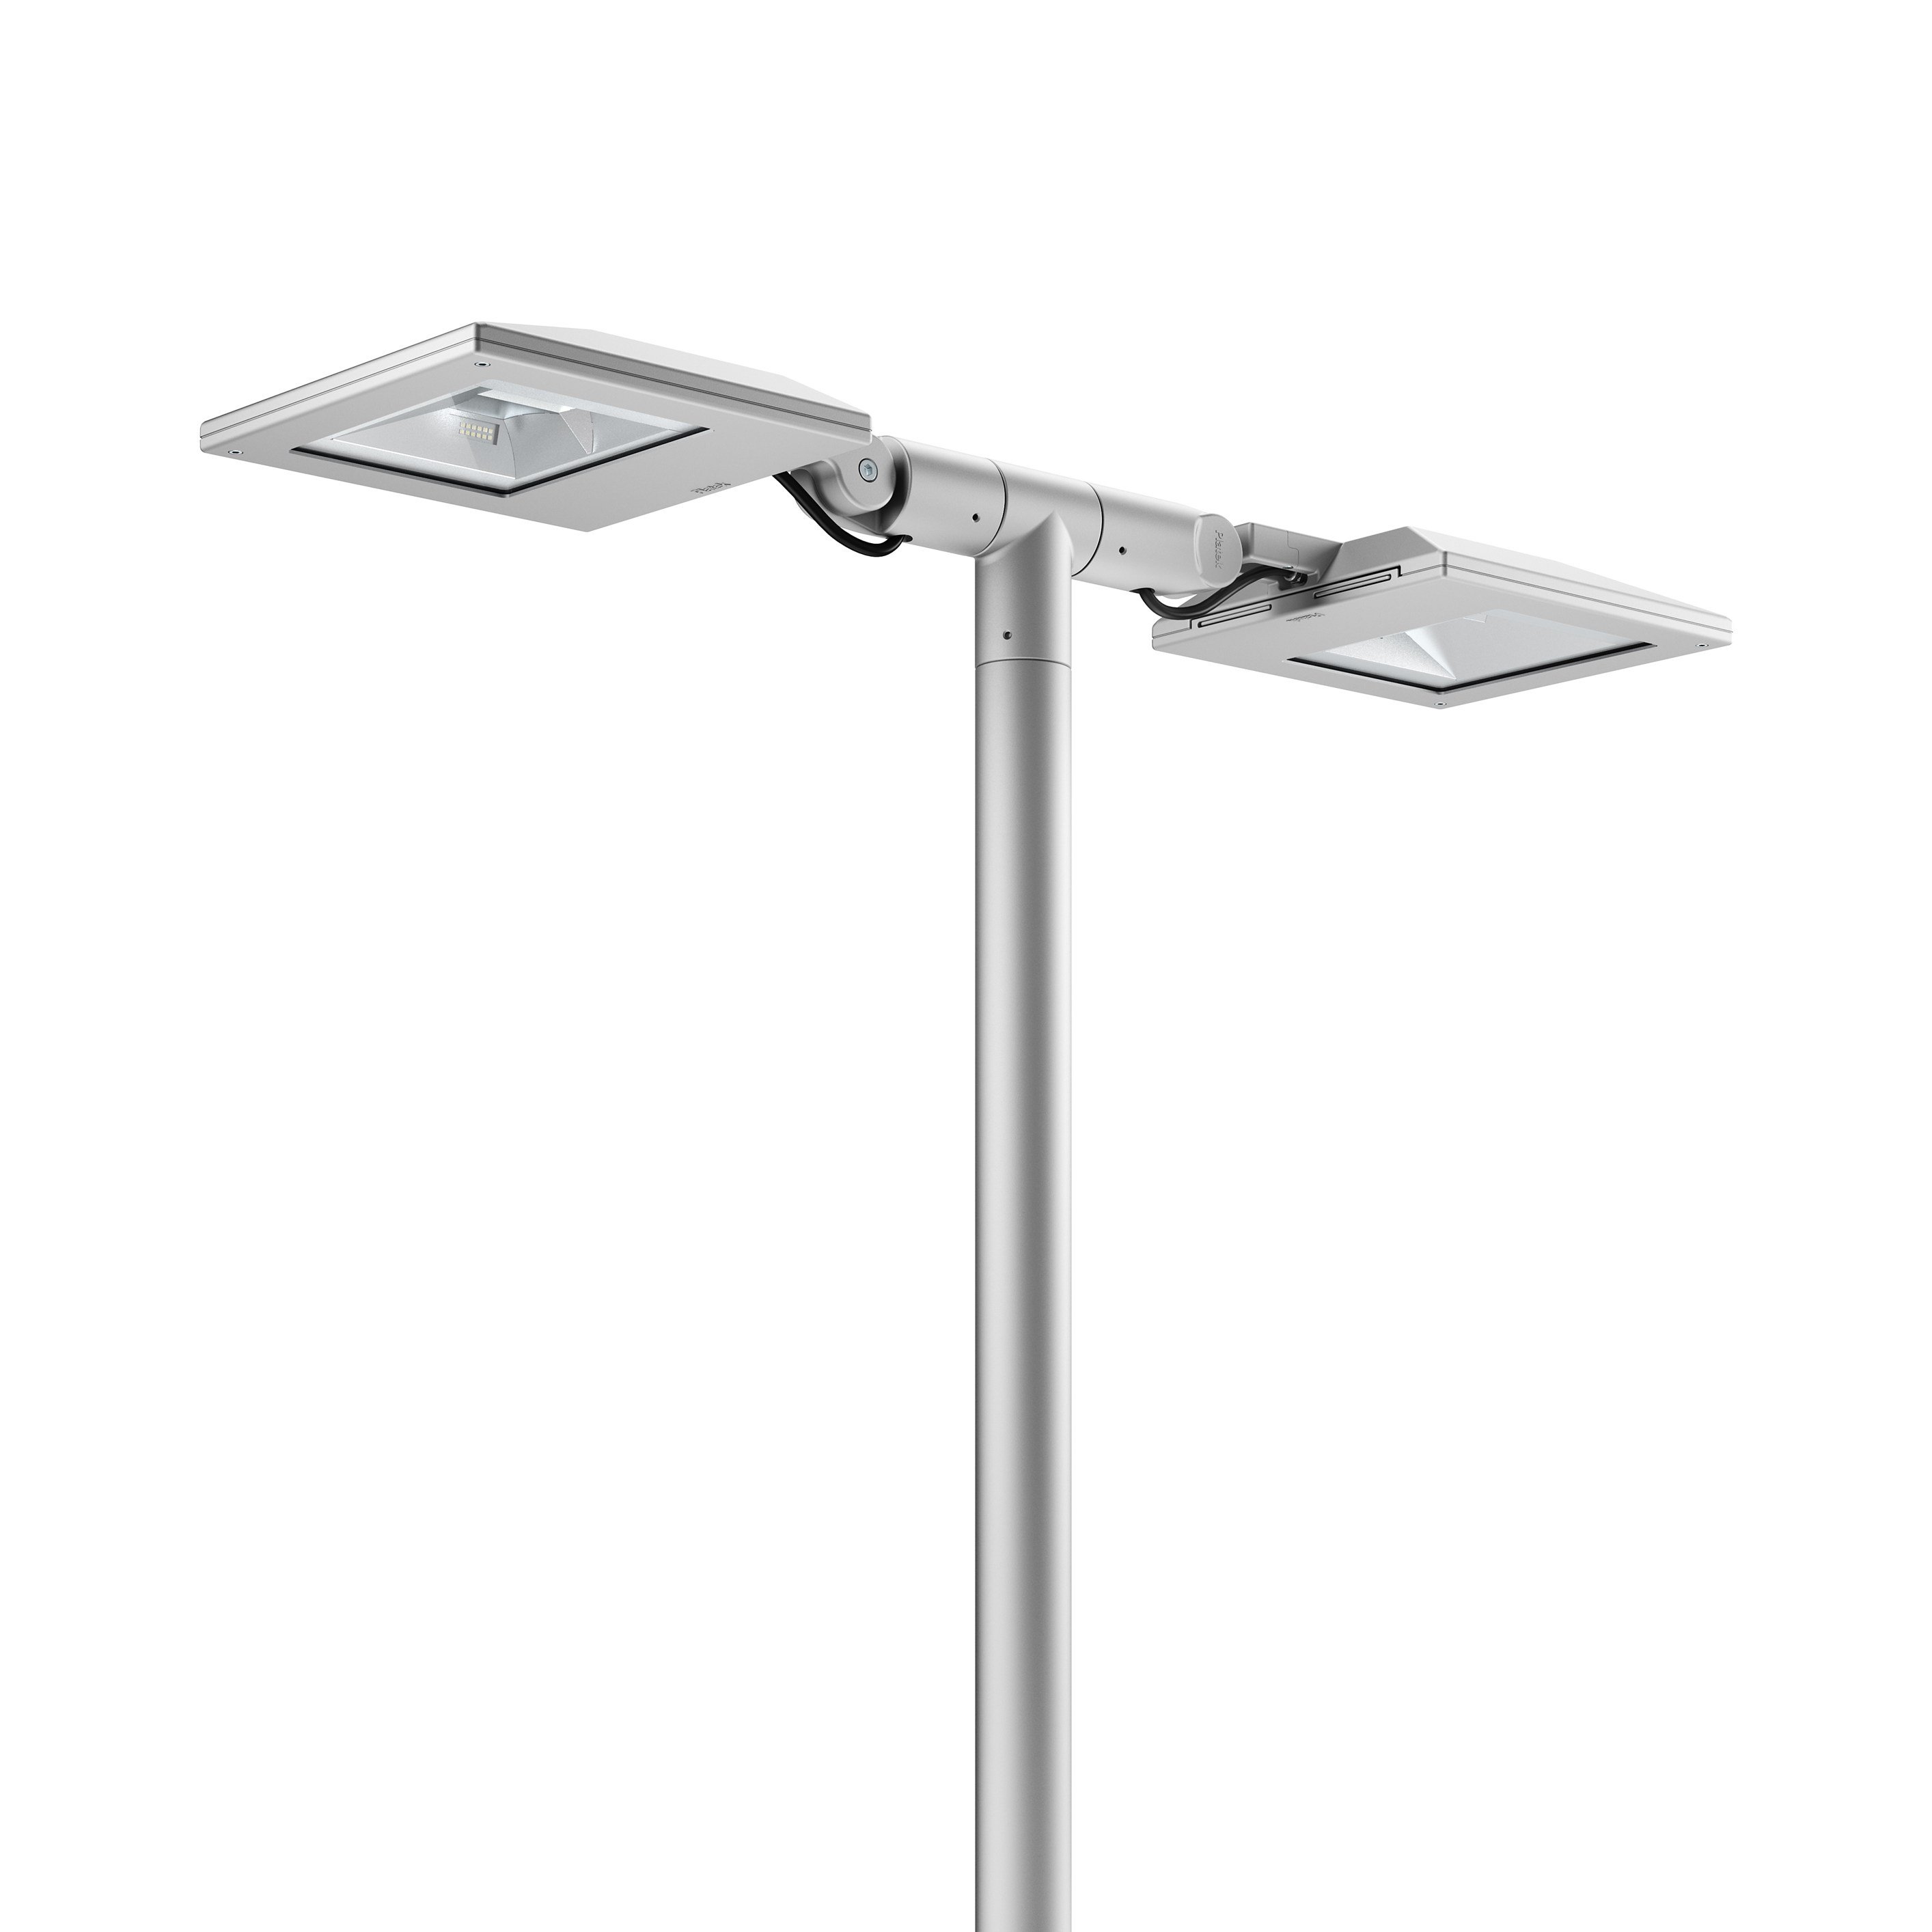 iluminacao jardim poste:Poste de jardim LED de alumínio TARSIUS Testa Palo by Platek design